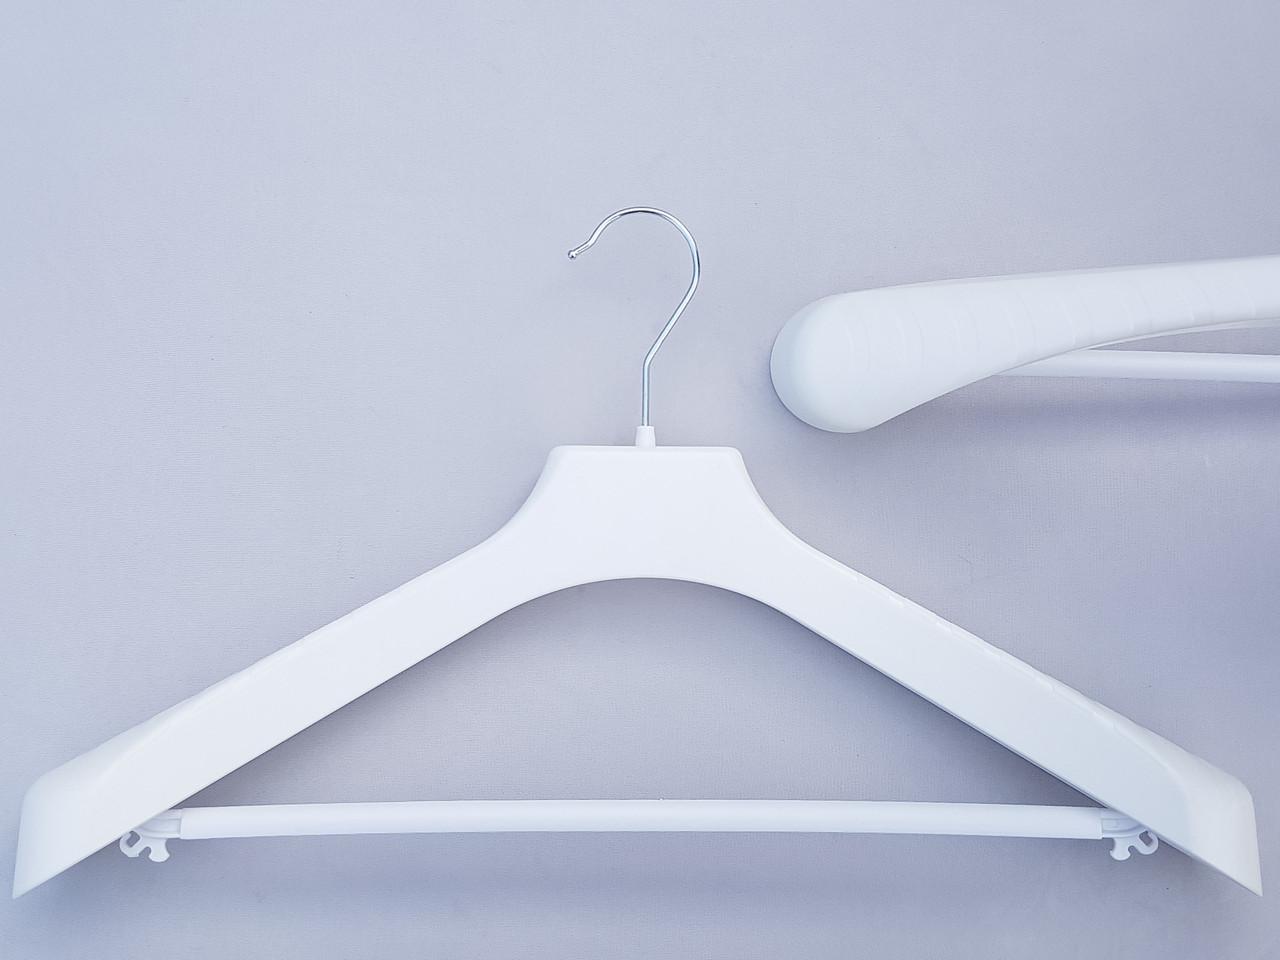 Плечики вешалки тремпеля V-PLp46 белого цвета, длина 46 см